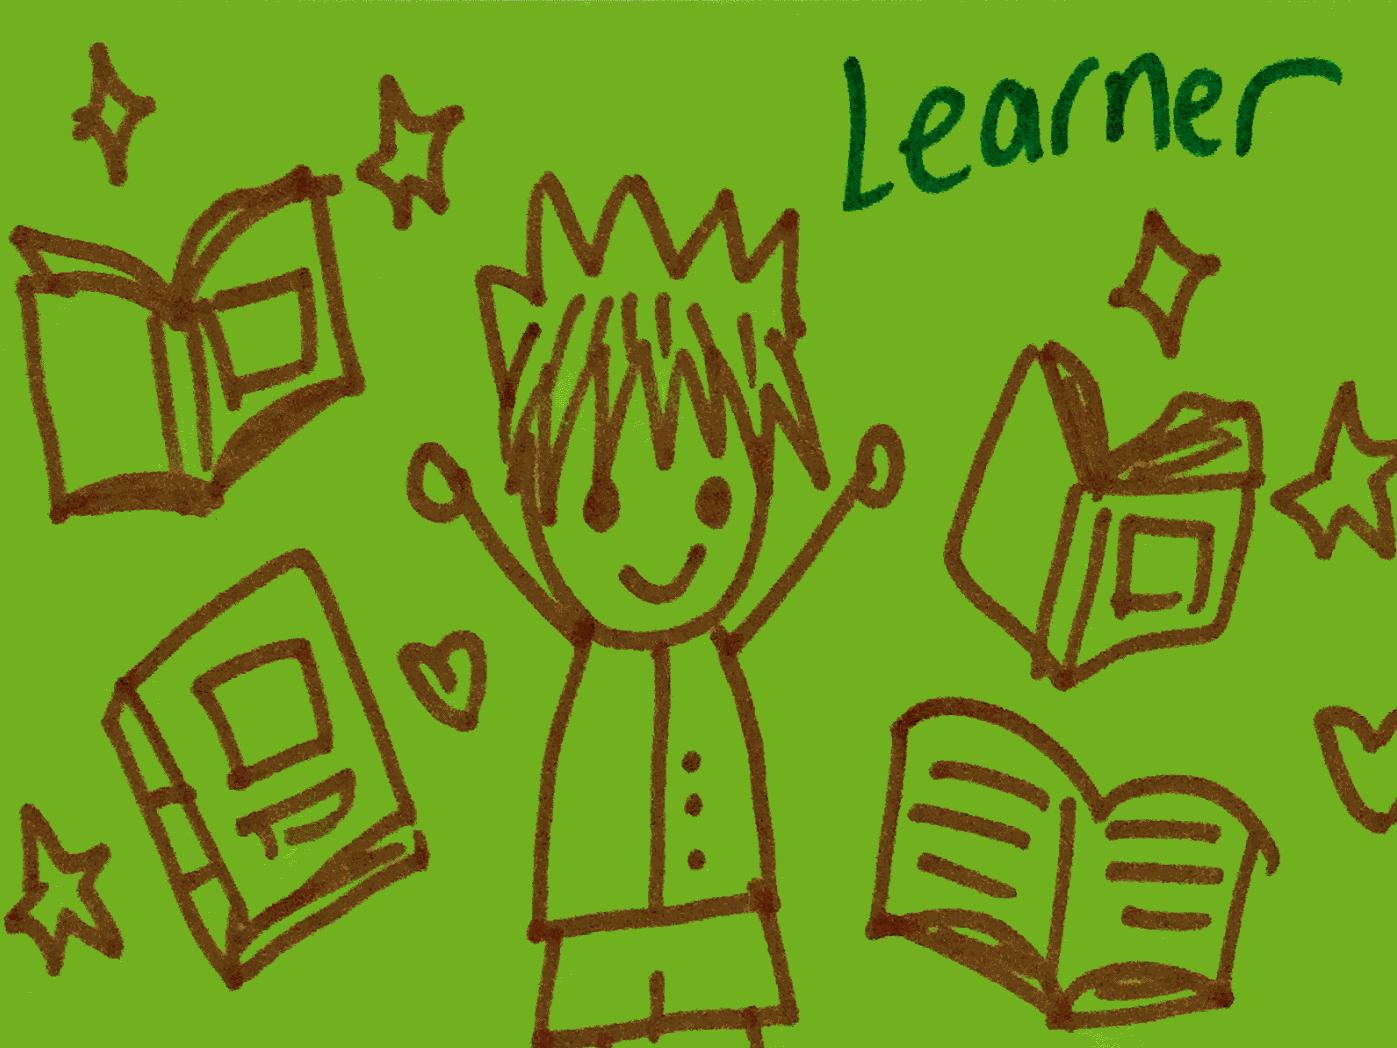 Learner Strengthsfinder King of Learning